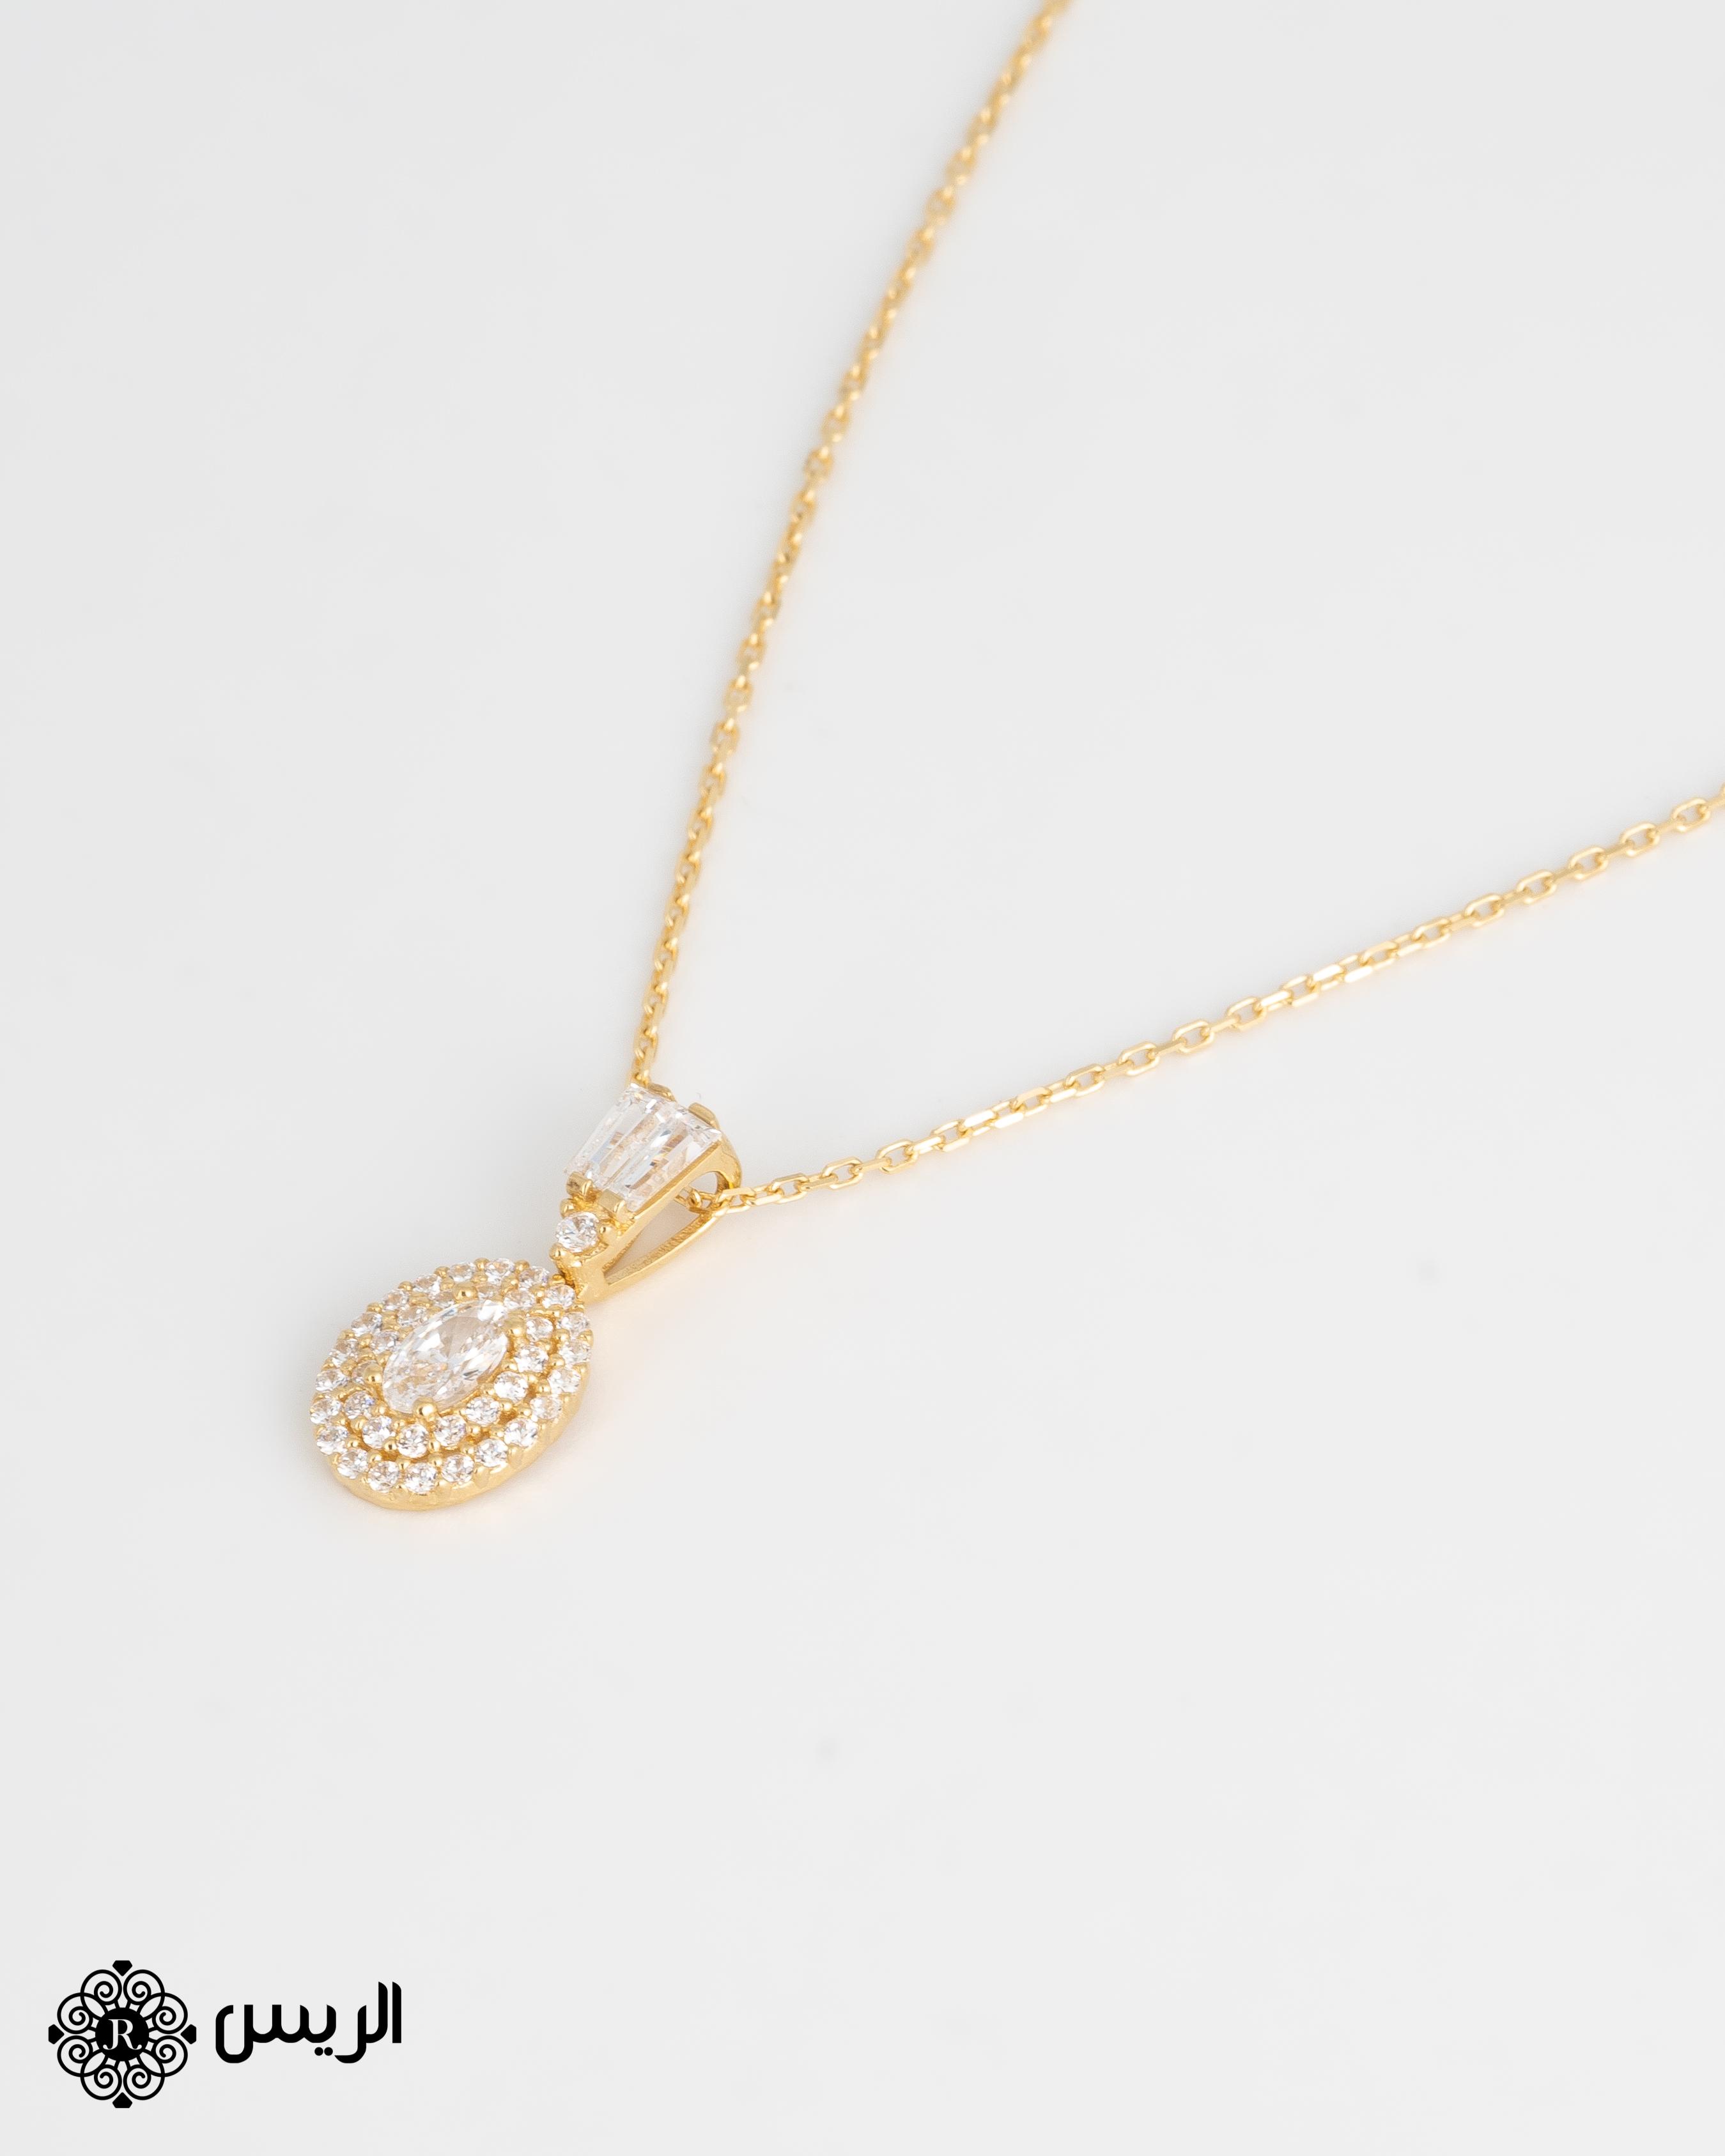 Raies jewelry Pendant with Chain Elegant تعليقة مع سلسله ناعمة الريس للمجوهرات